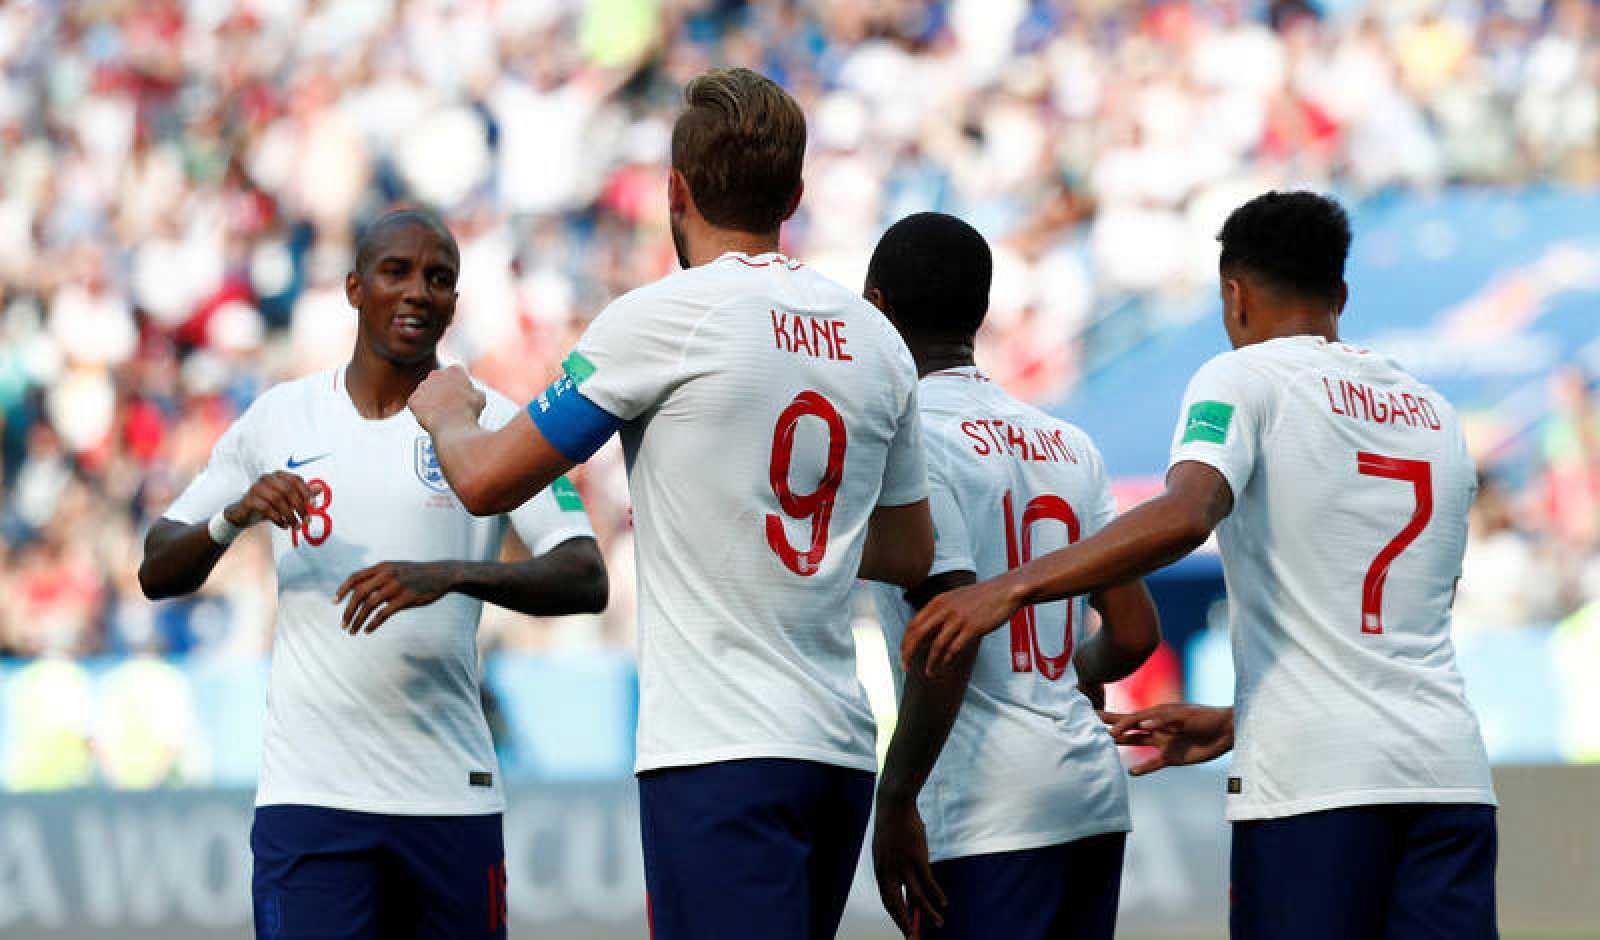 Inglaterra arrolla a Panamá y arrebata la primera plaza a Bélgica